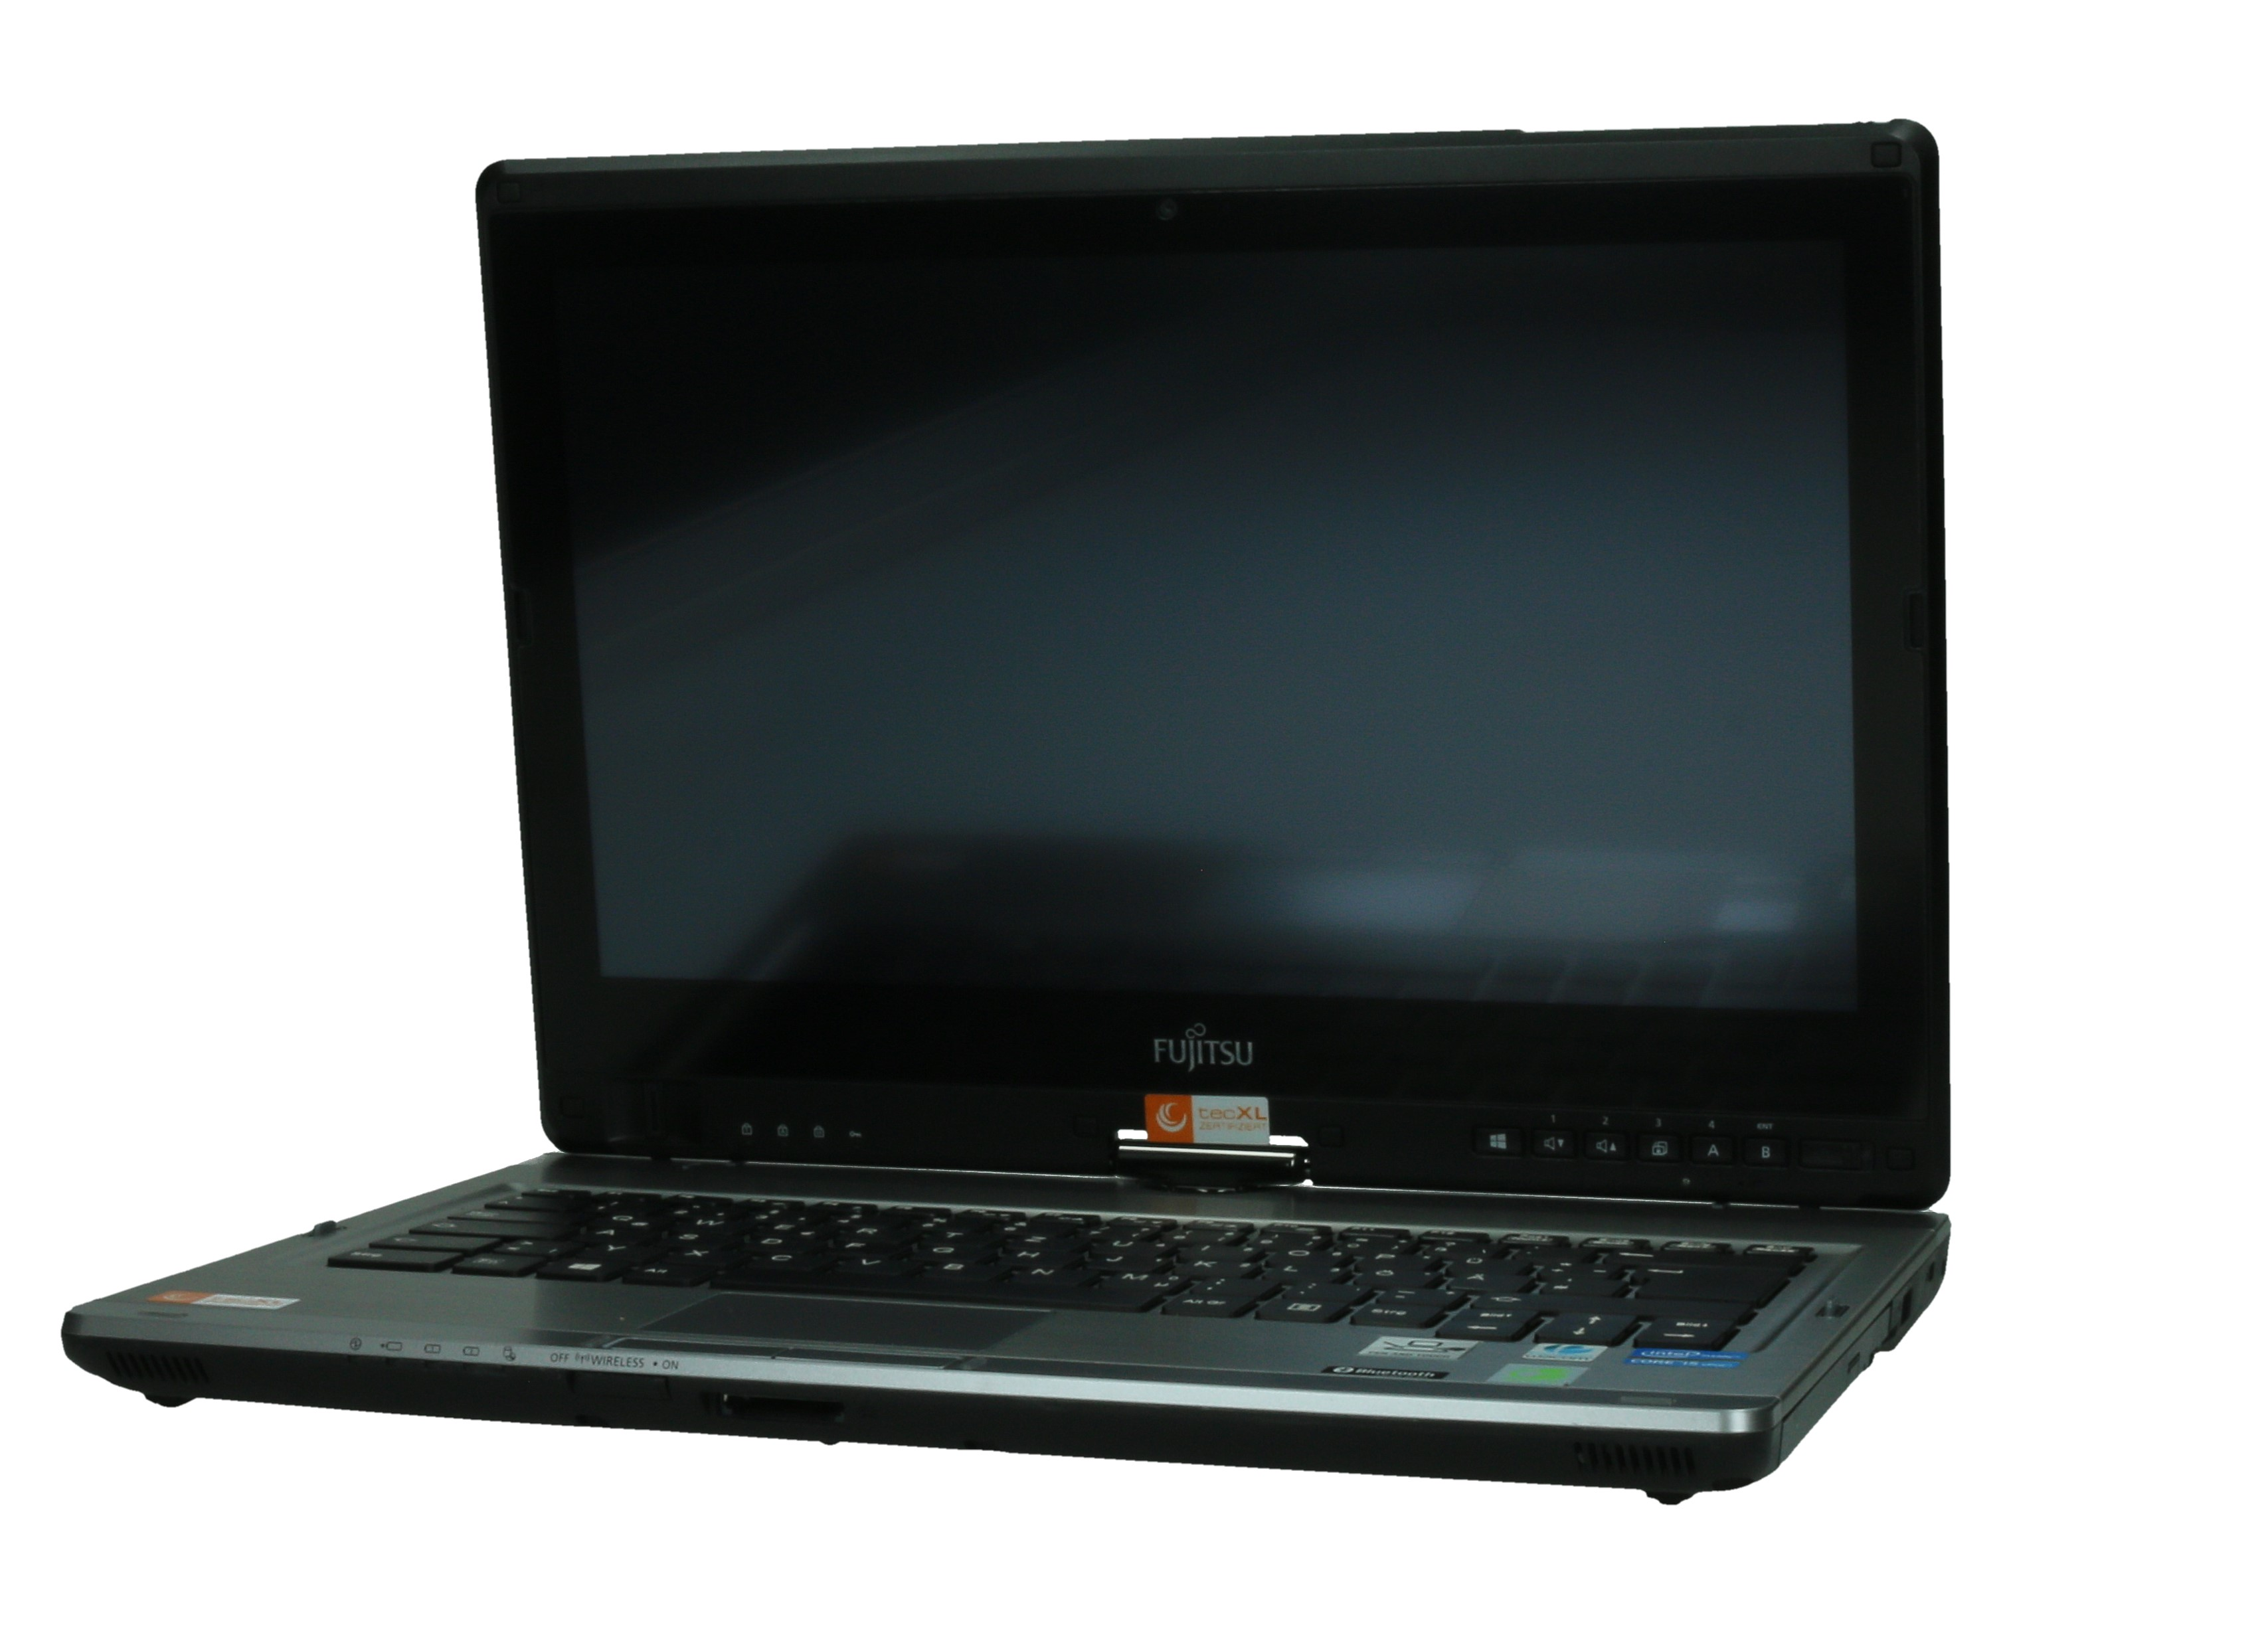 Fujitsu LIFEBOOK T902 Tablet PC